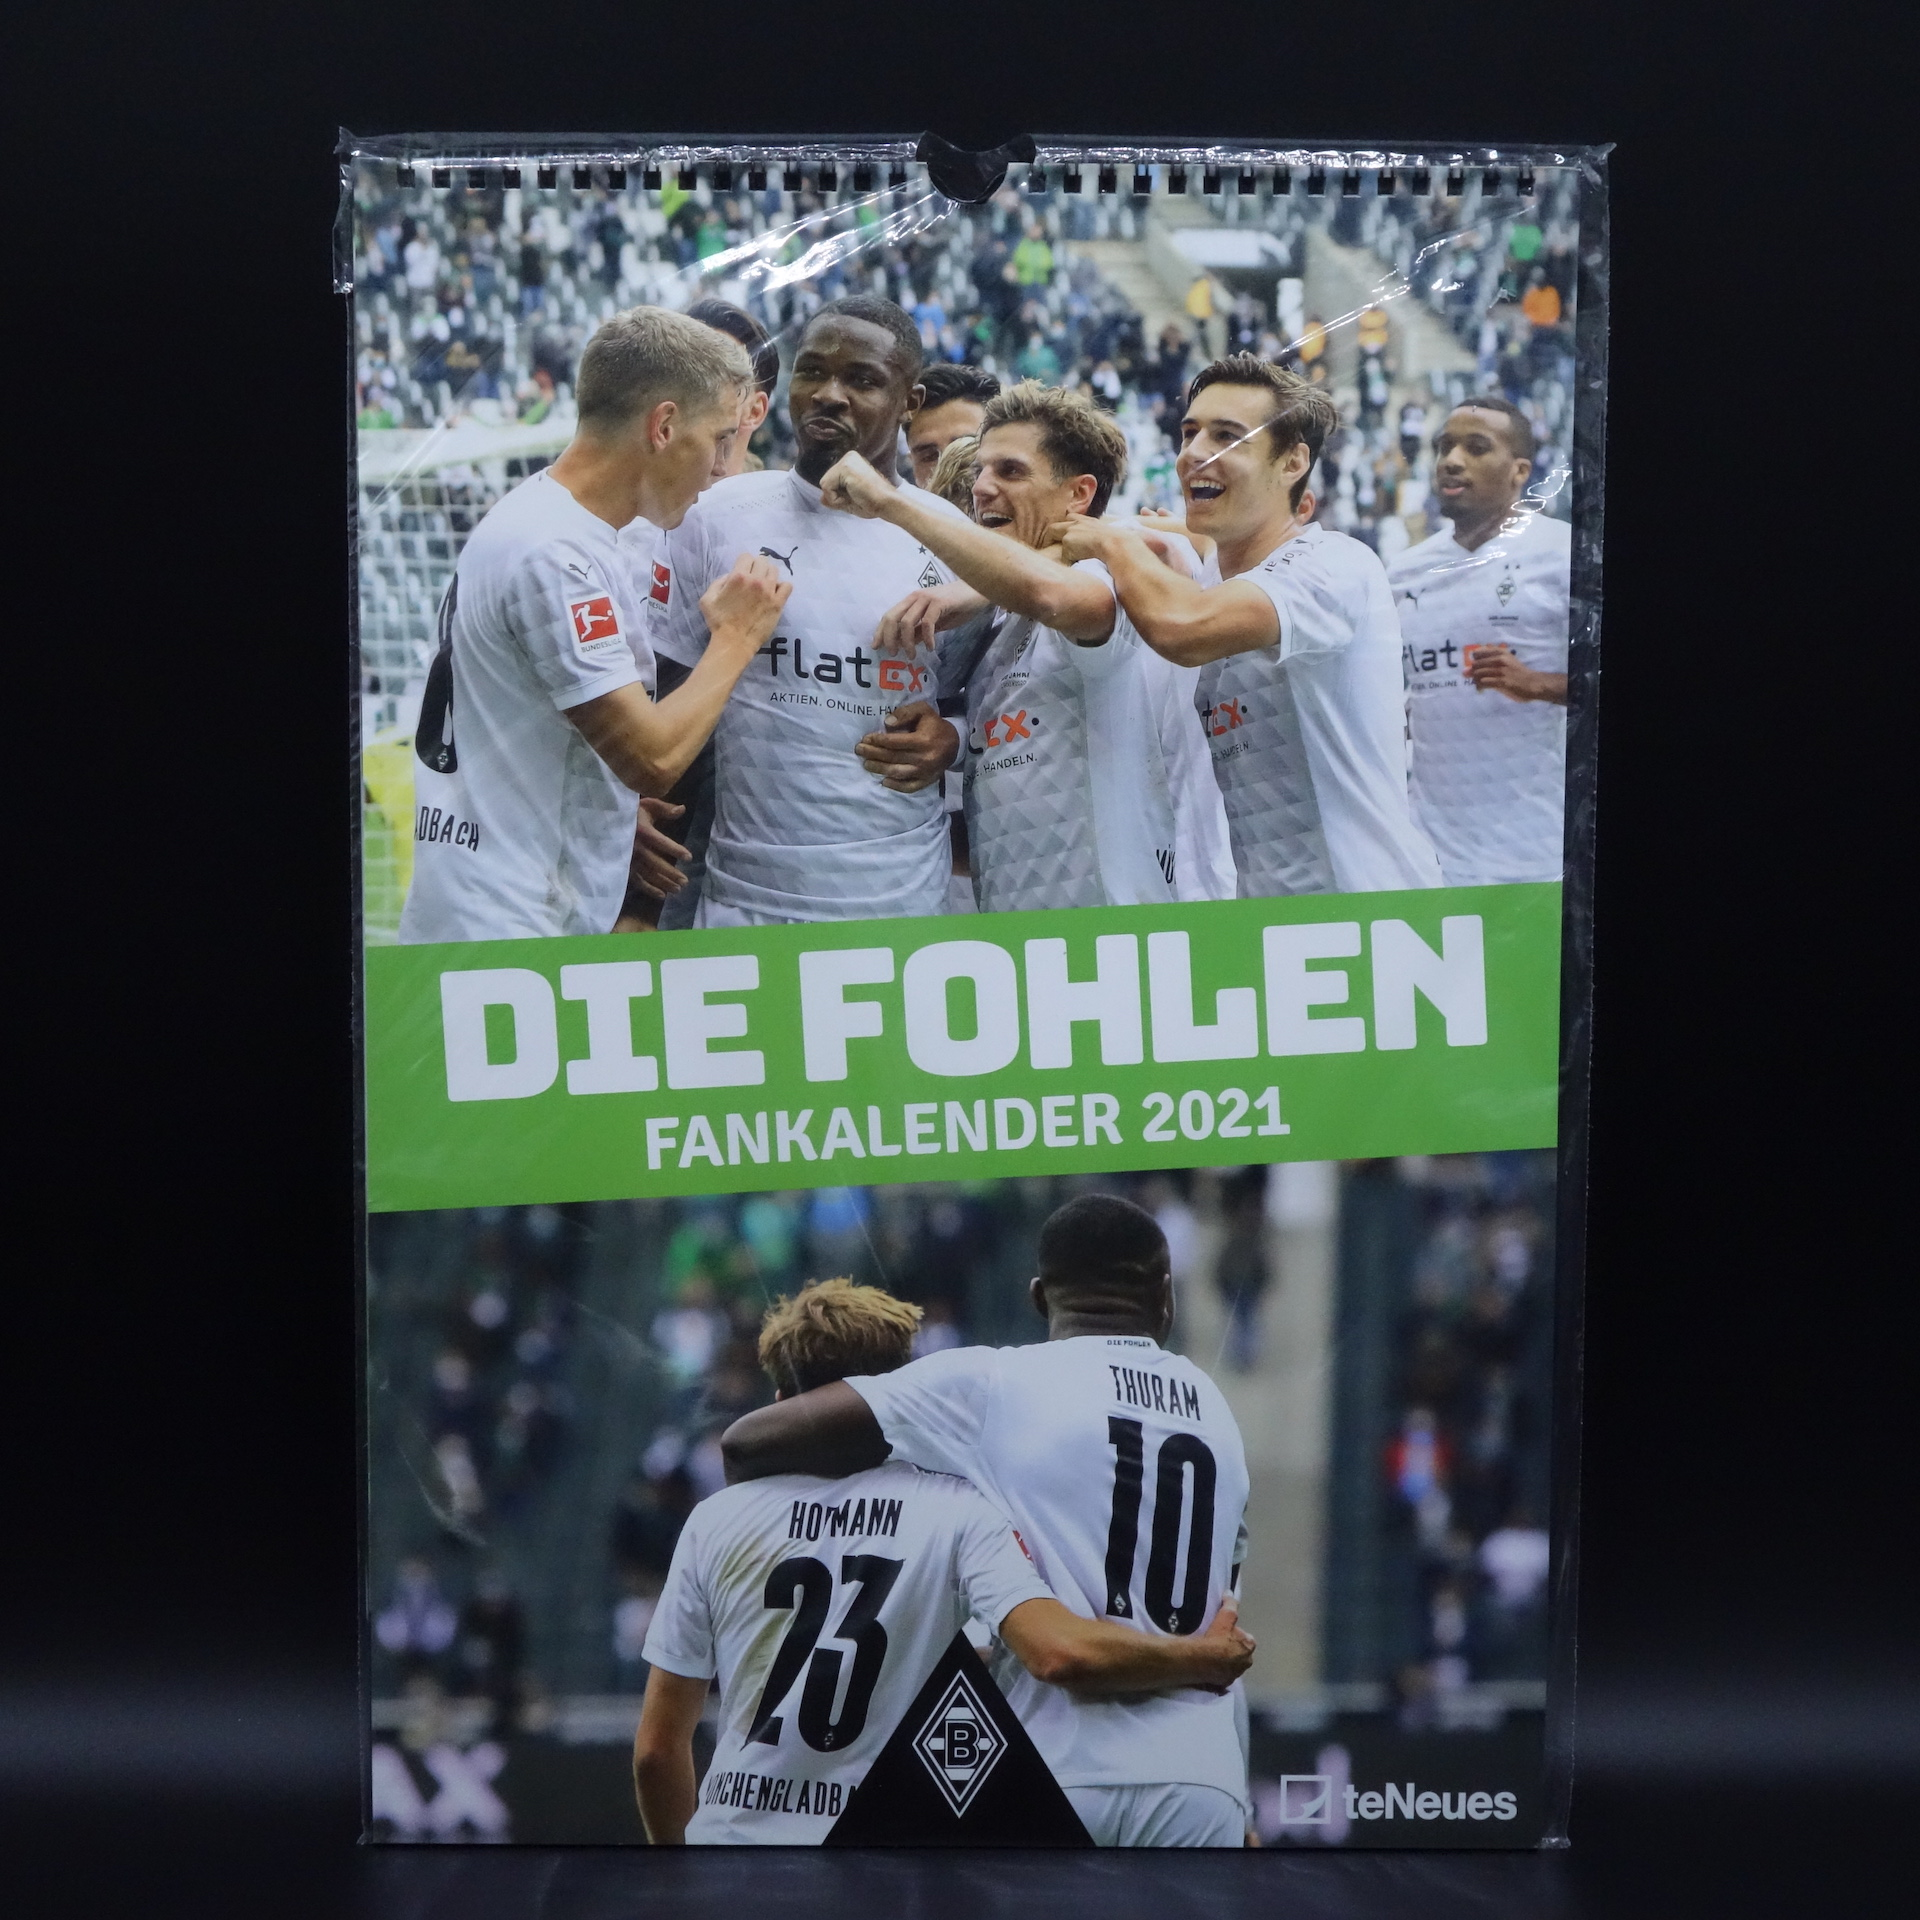 Borussia Mönchengladbach Fan Kalender 2021 Die Fohlen